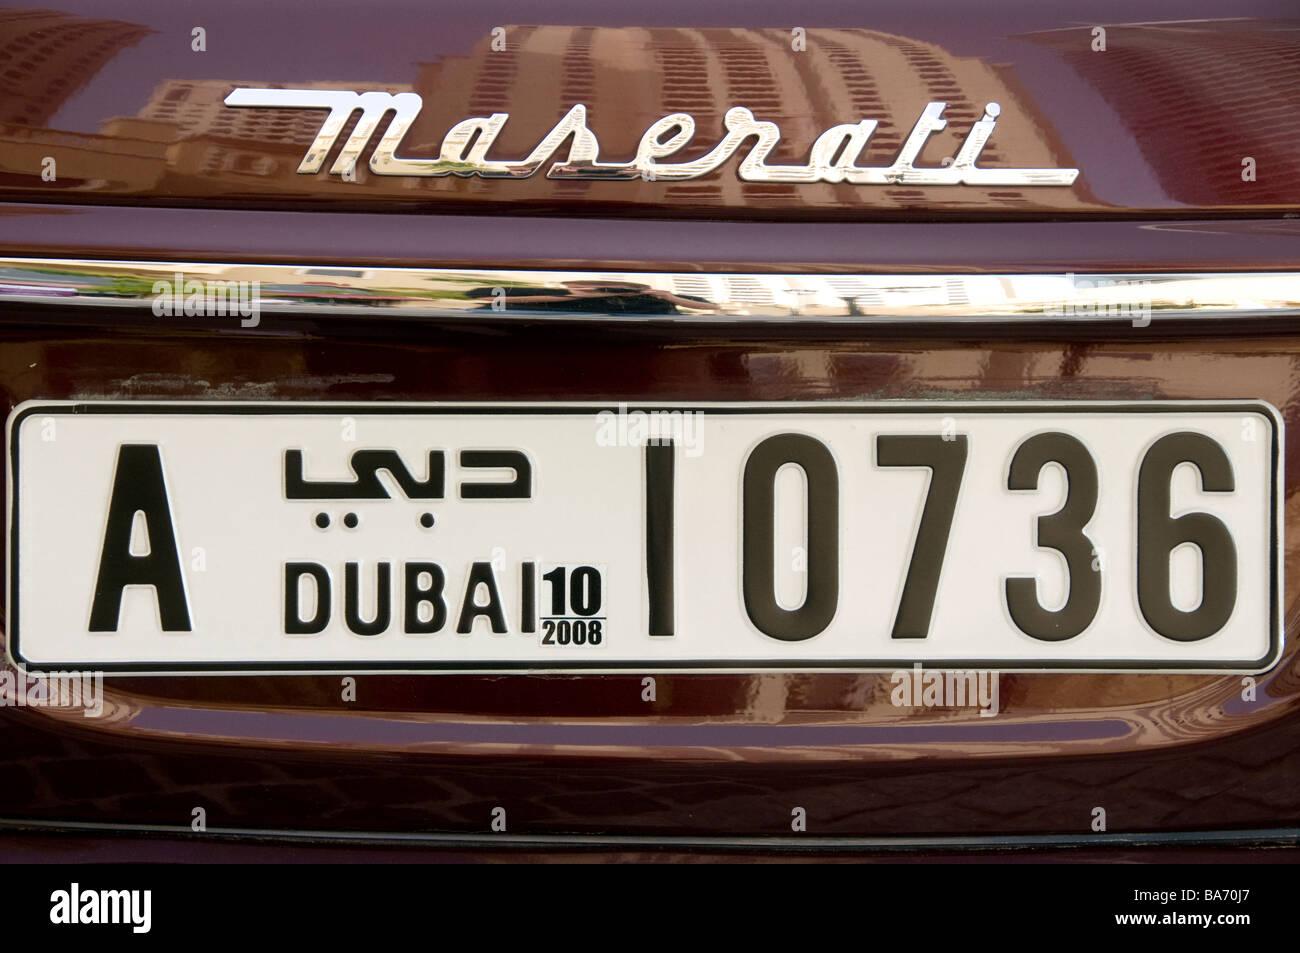 Maserati in Dubai United Arab Emirates - Stock Image